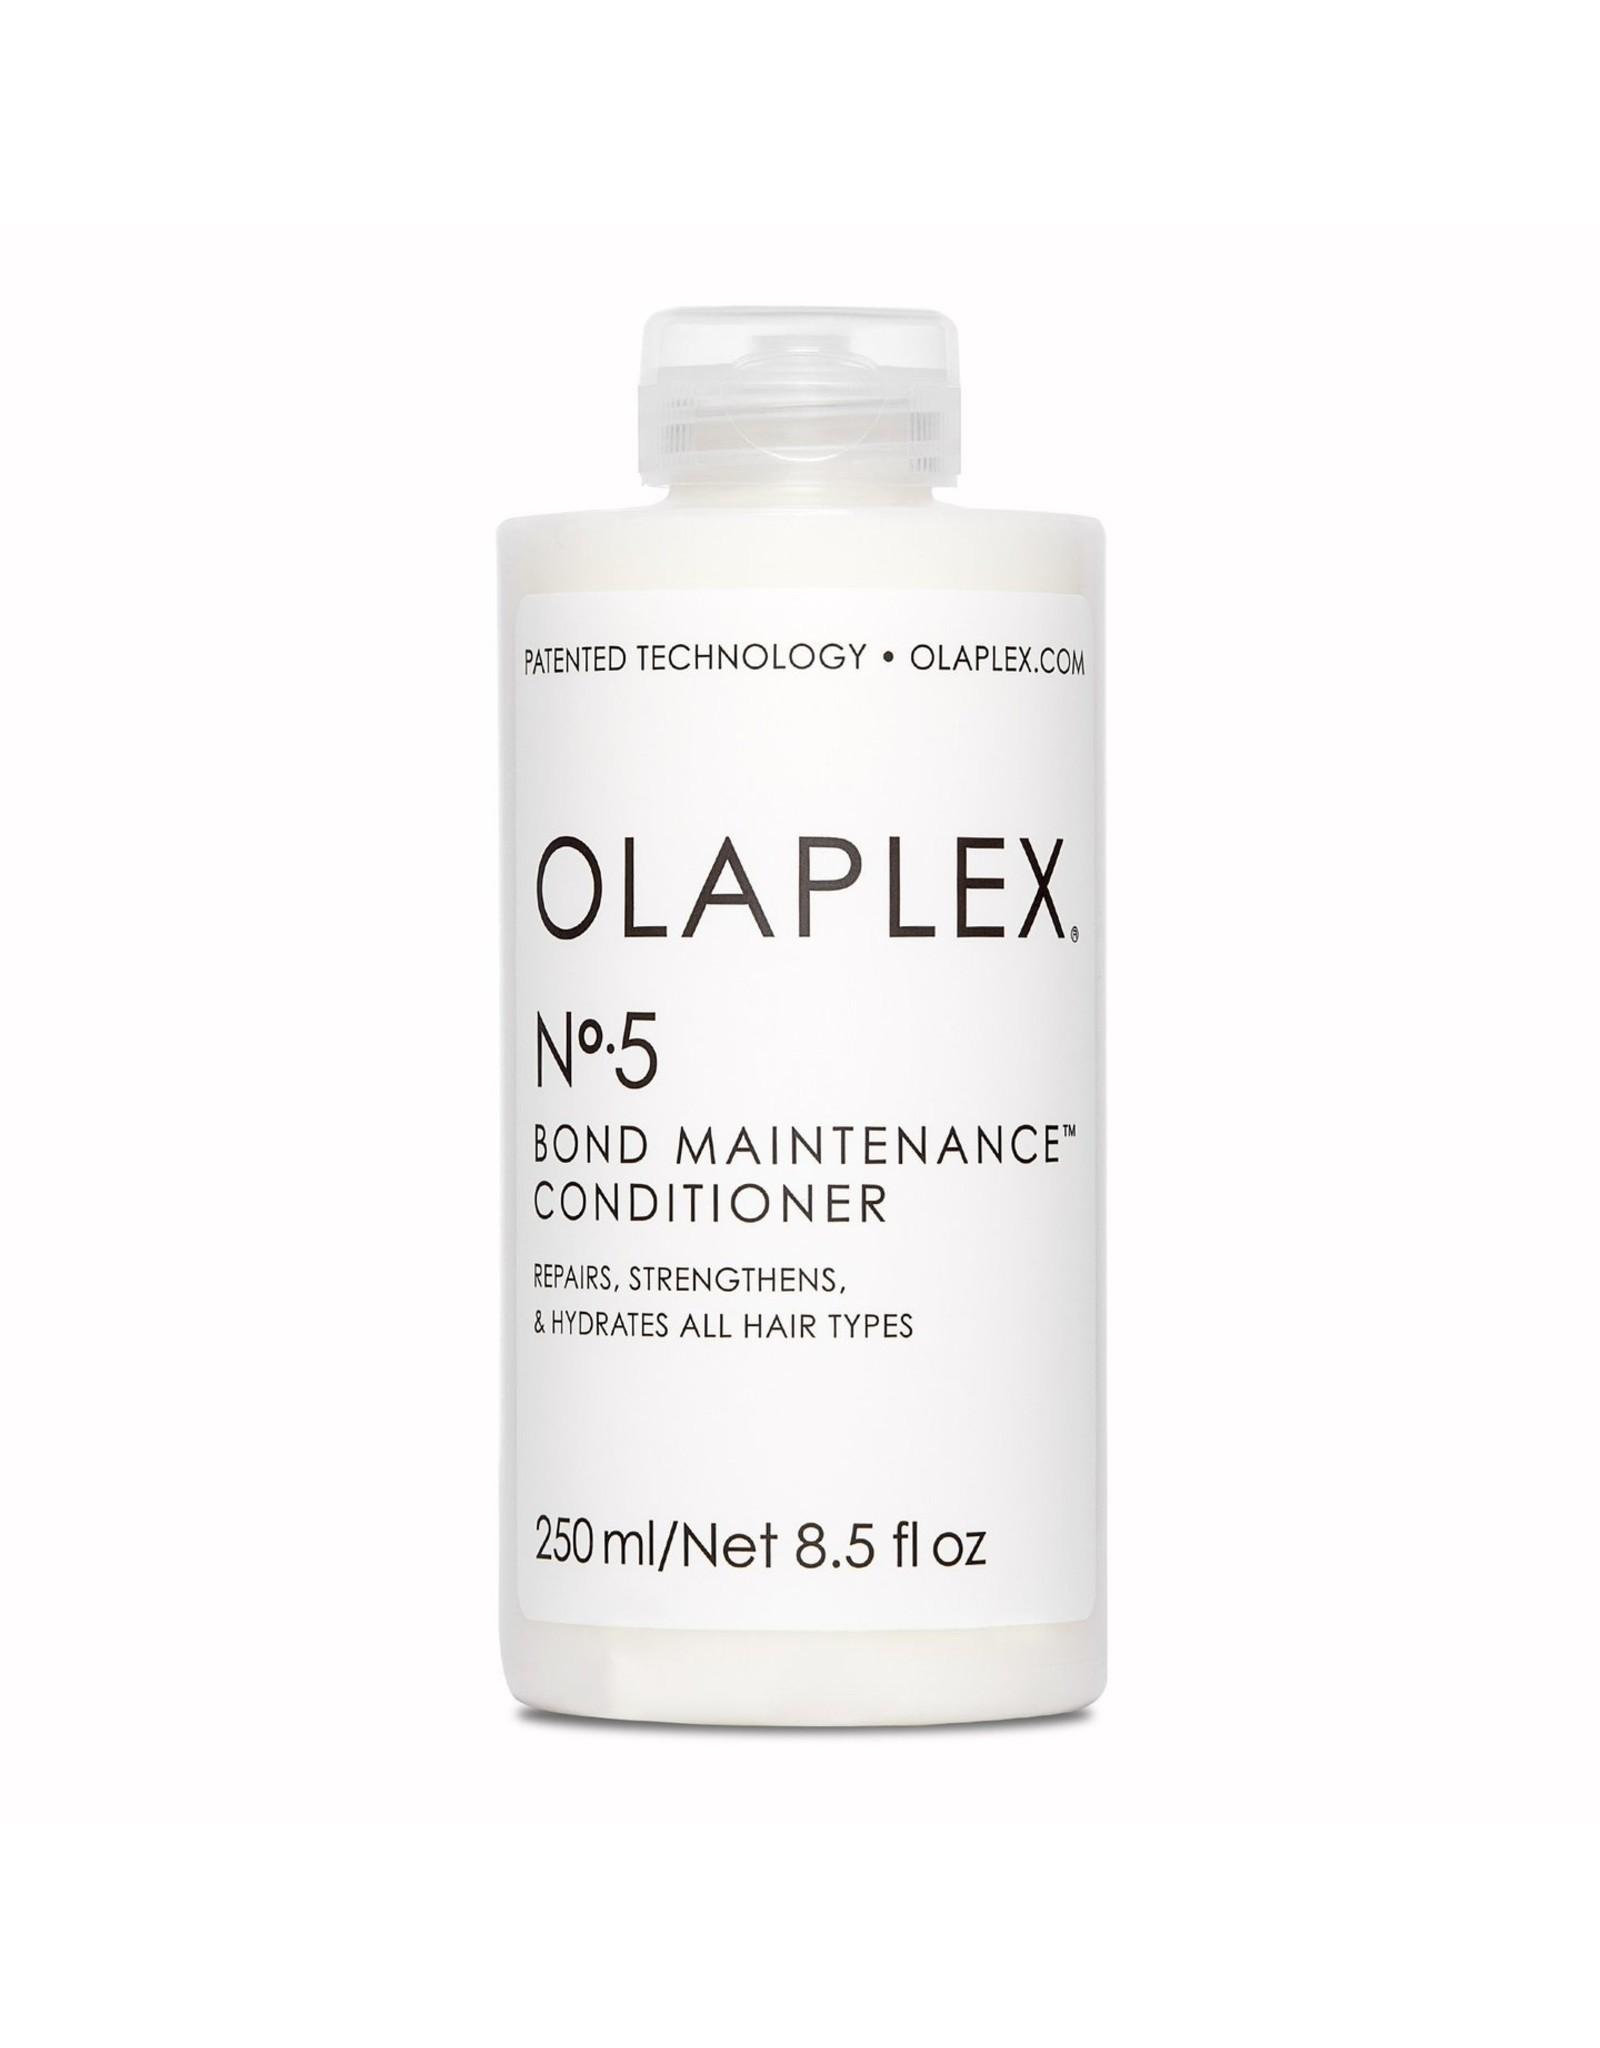 OLAPLEX NO. 5 - BOND MAINTENANCE CONDITIONER ®️